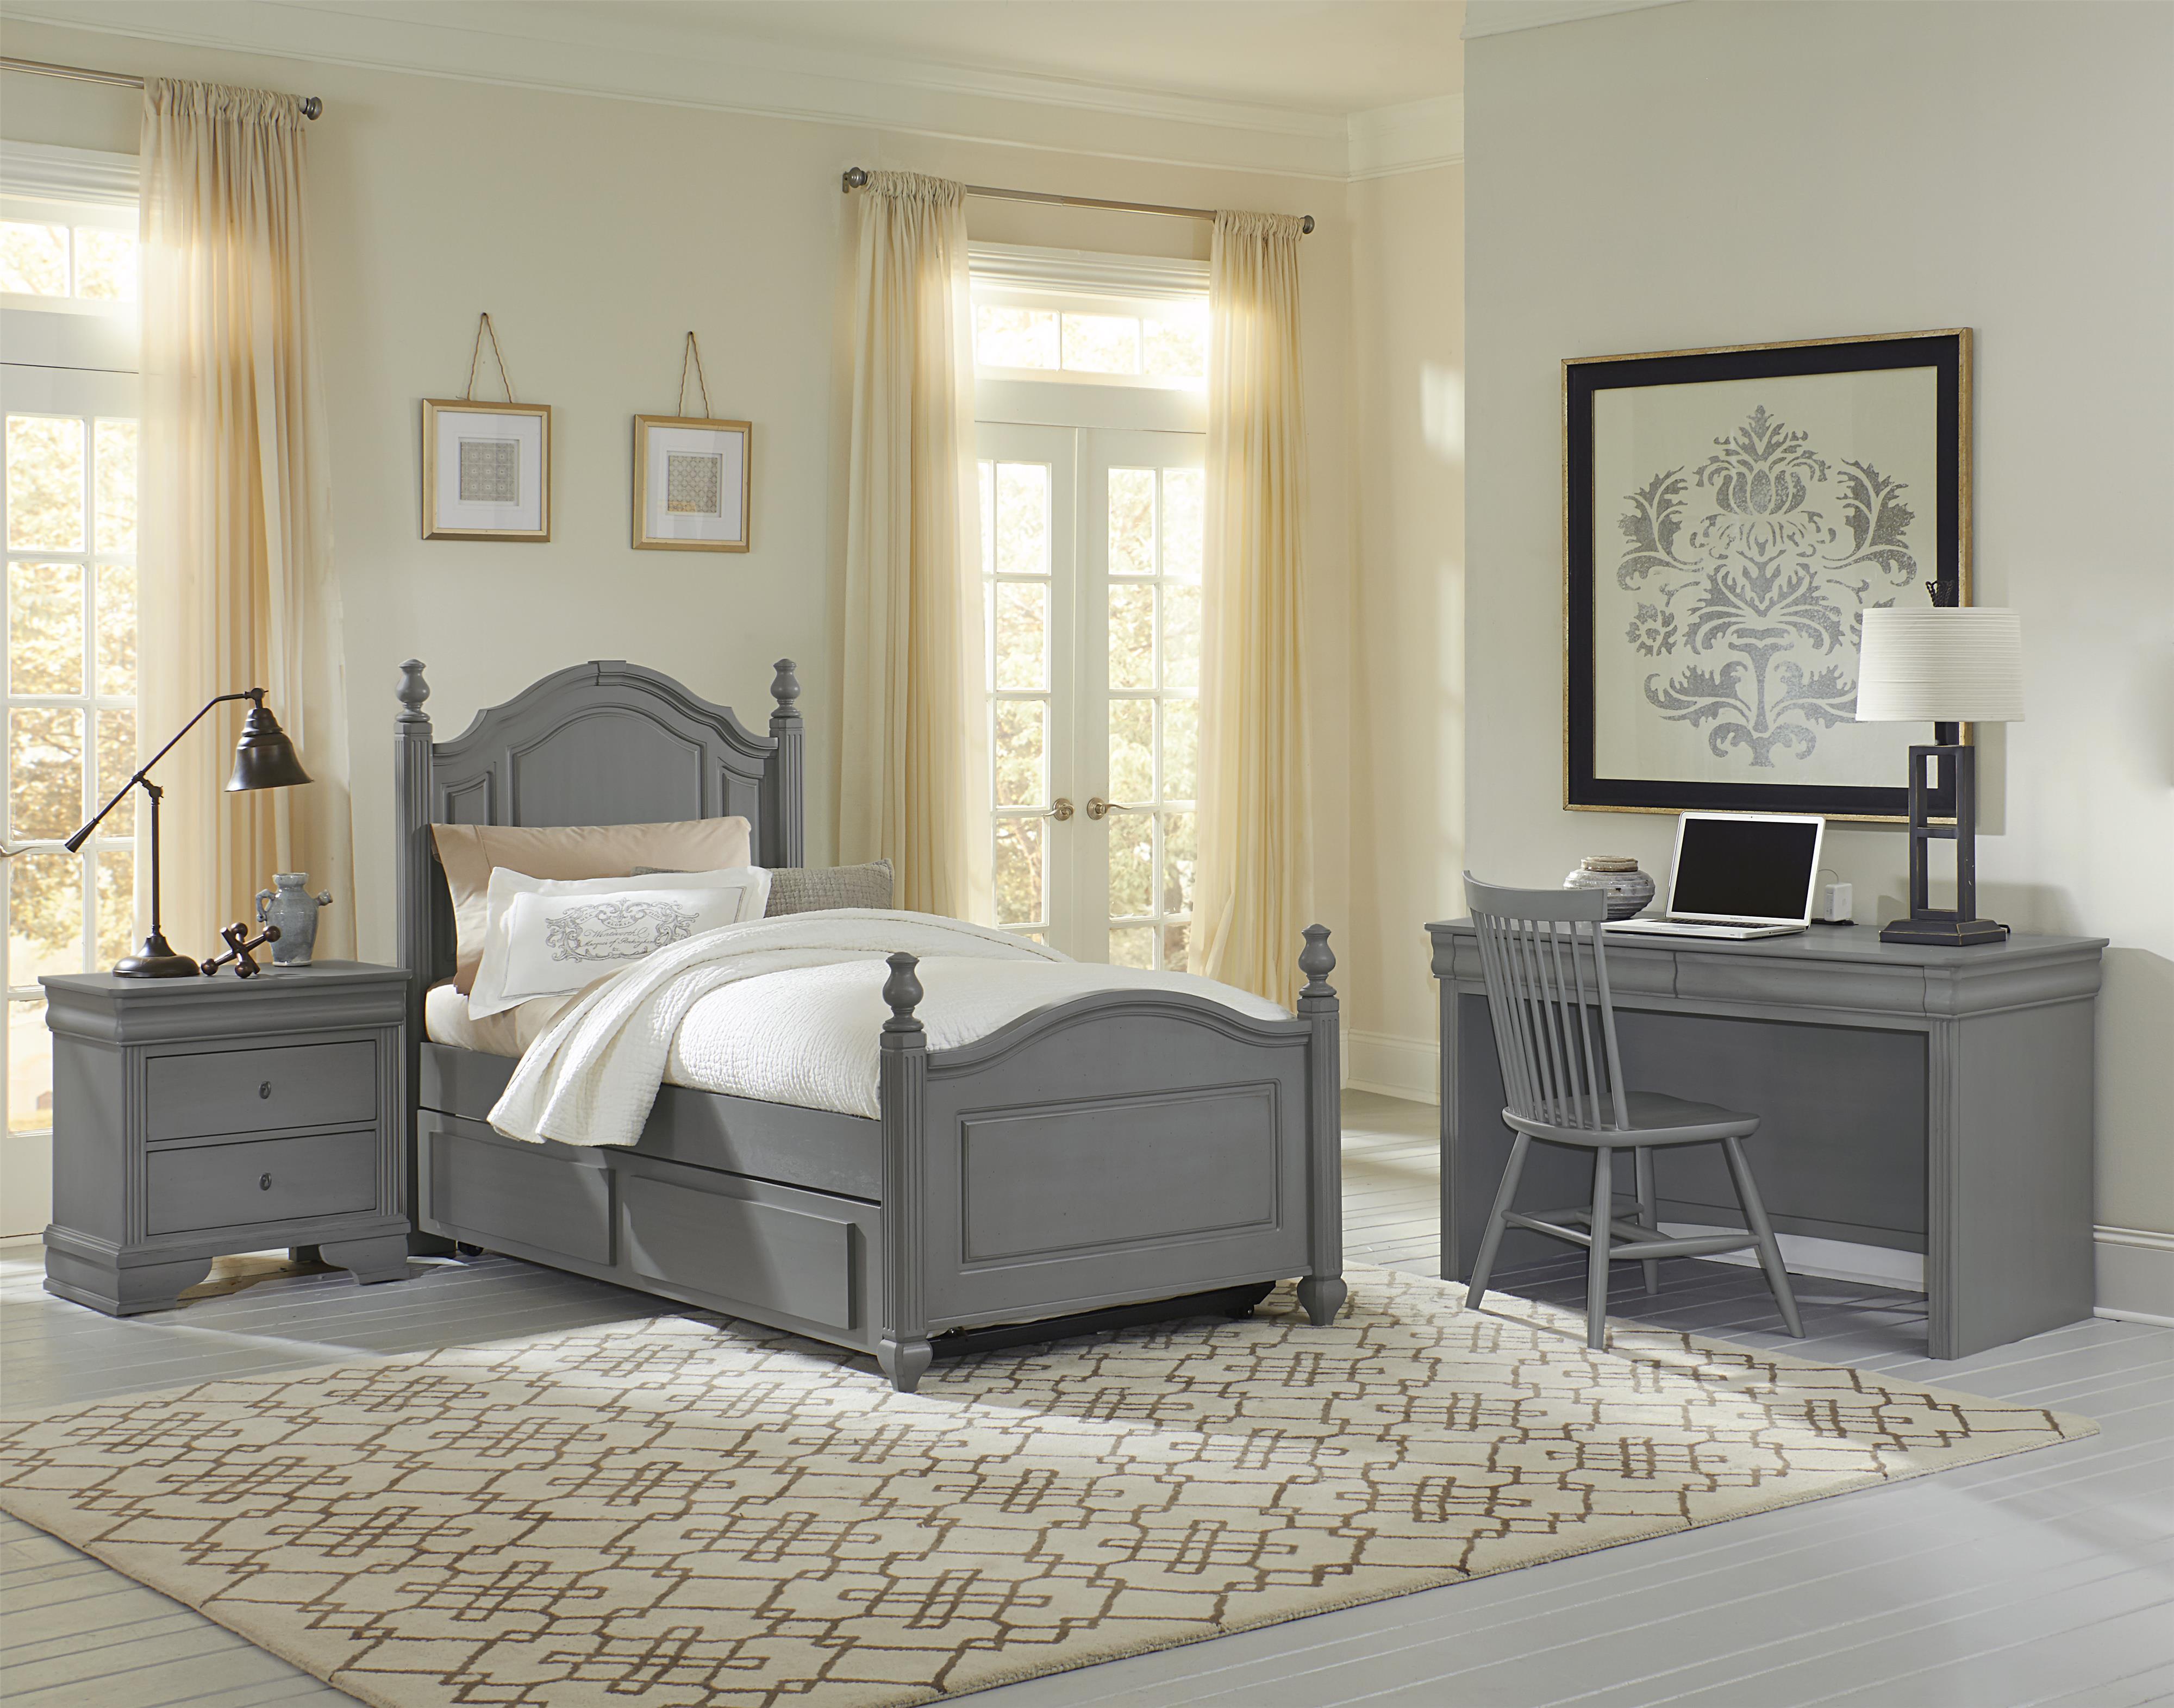 Vaughan Bassett French Market Twin Bedroom Group Dunk & Bright Furnitur